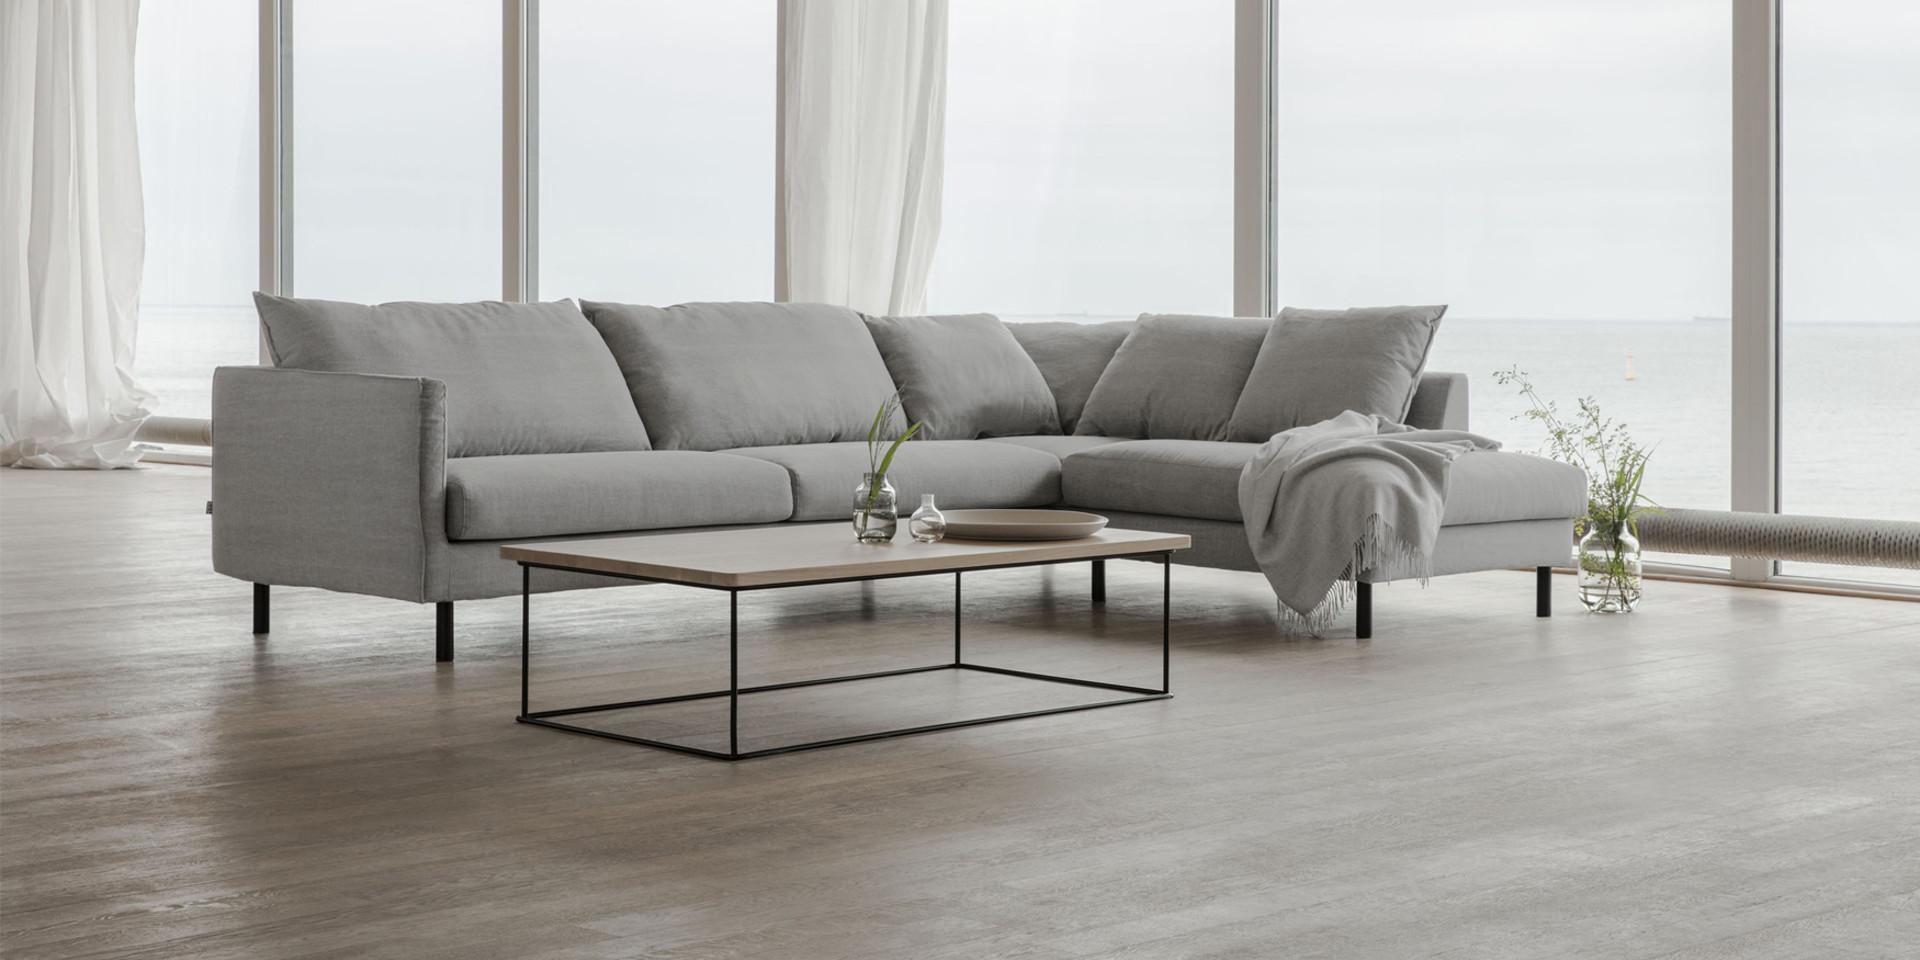 BIANCA_arrangement_set2_big_small_cushions_kiss4_light_grey_3